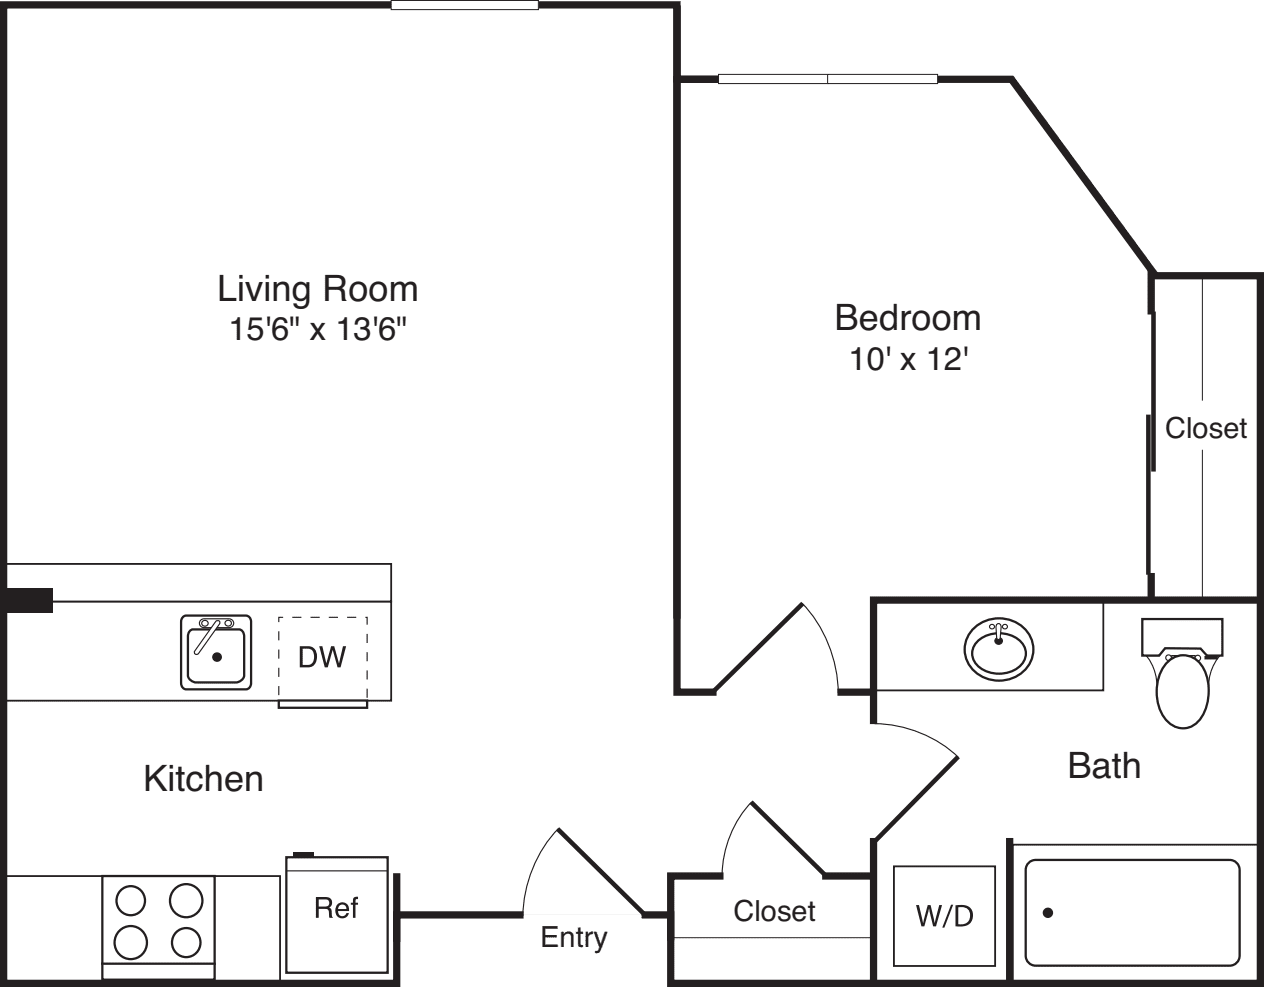 1 Bedroom C no balcony